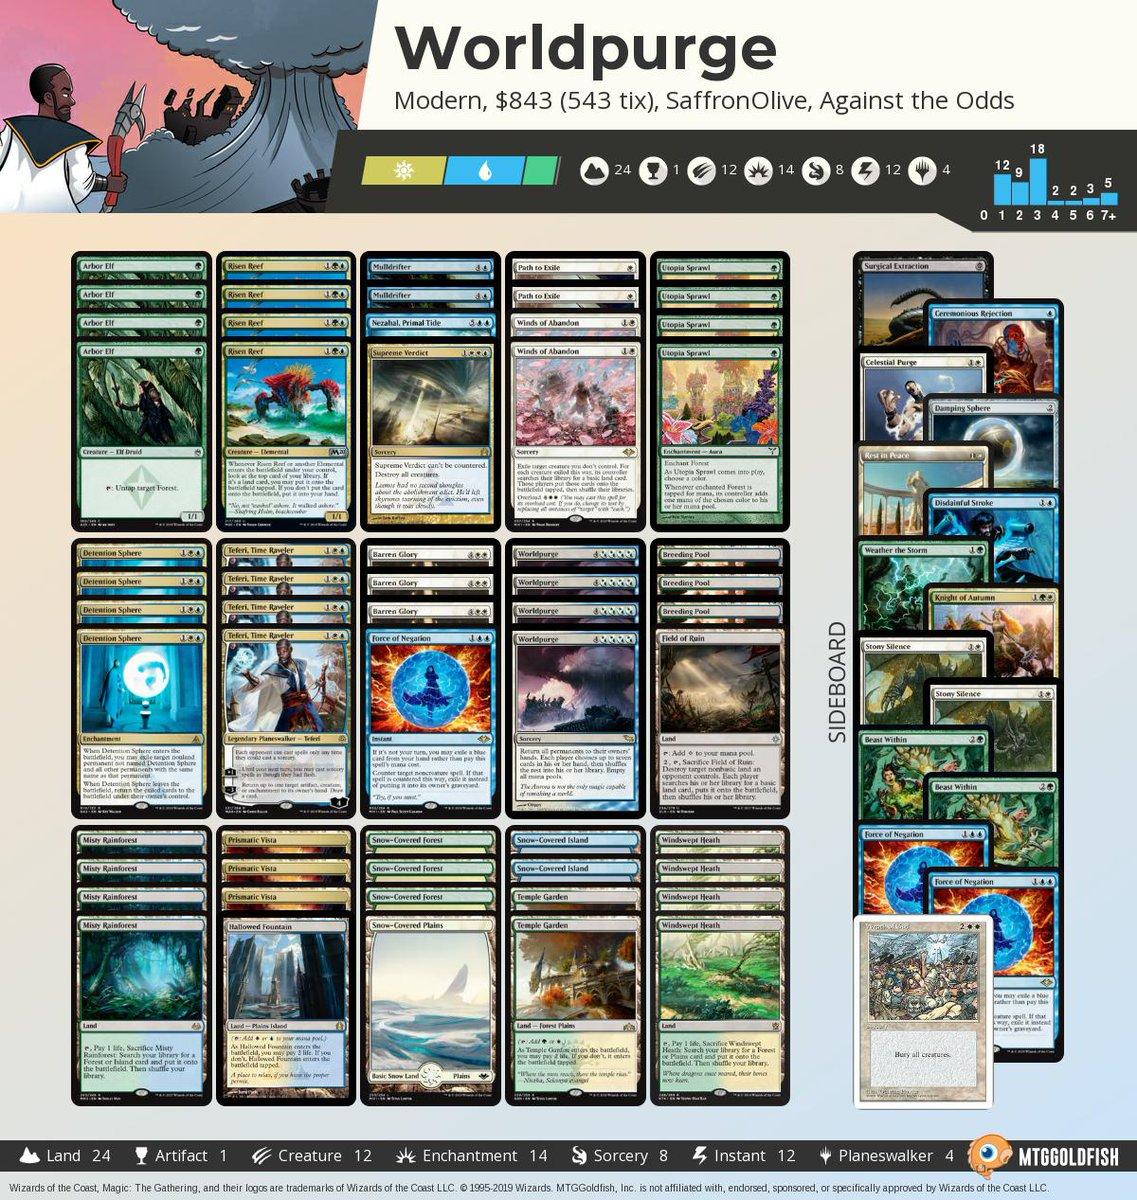 Against the Odds: Worldpurge (Modern, Magic Online) mtggoldfish.com/articles/again… #mtg #mtgo #againsttheodds